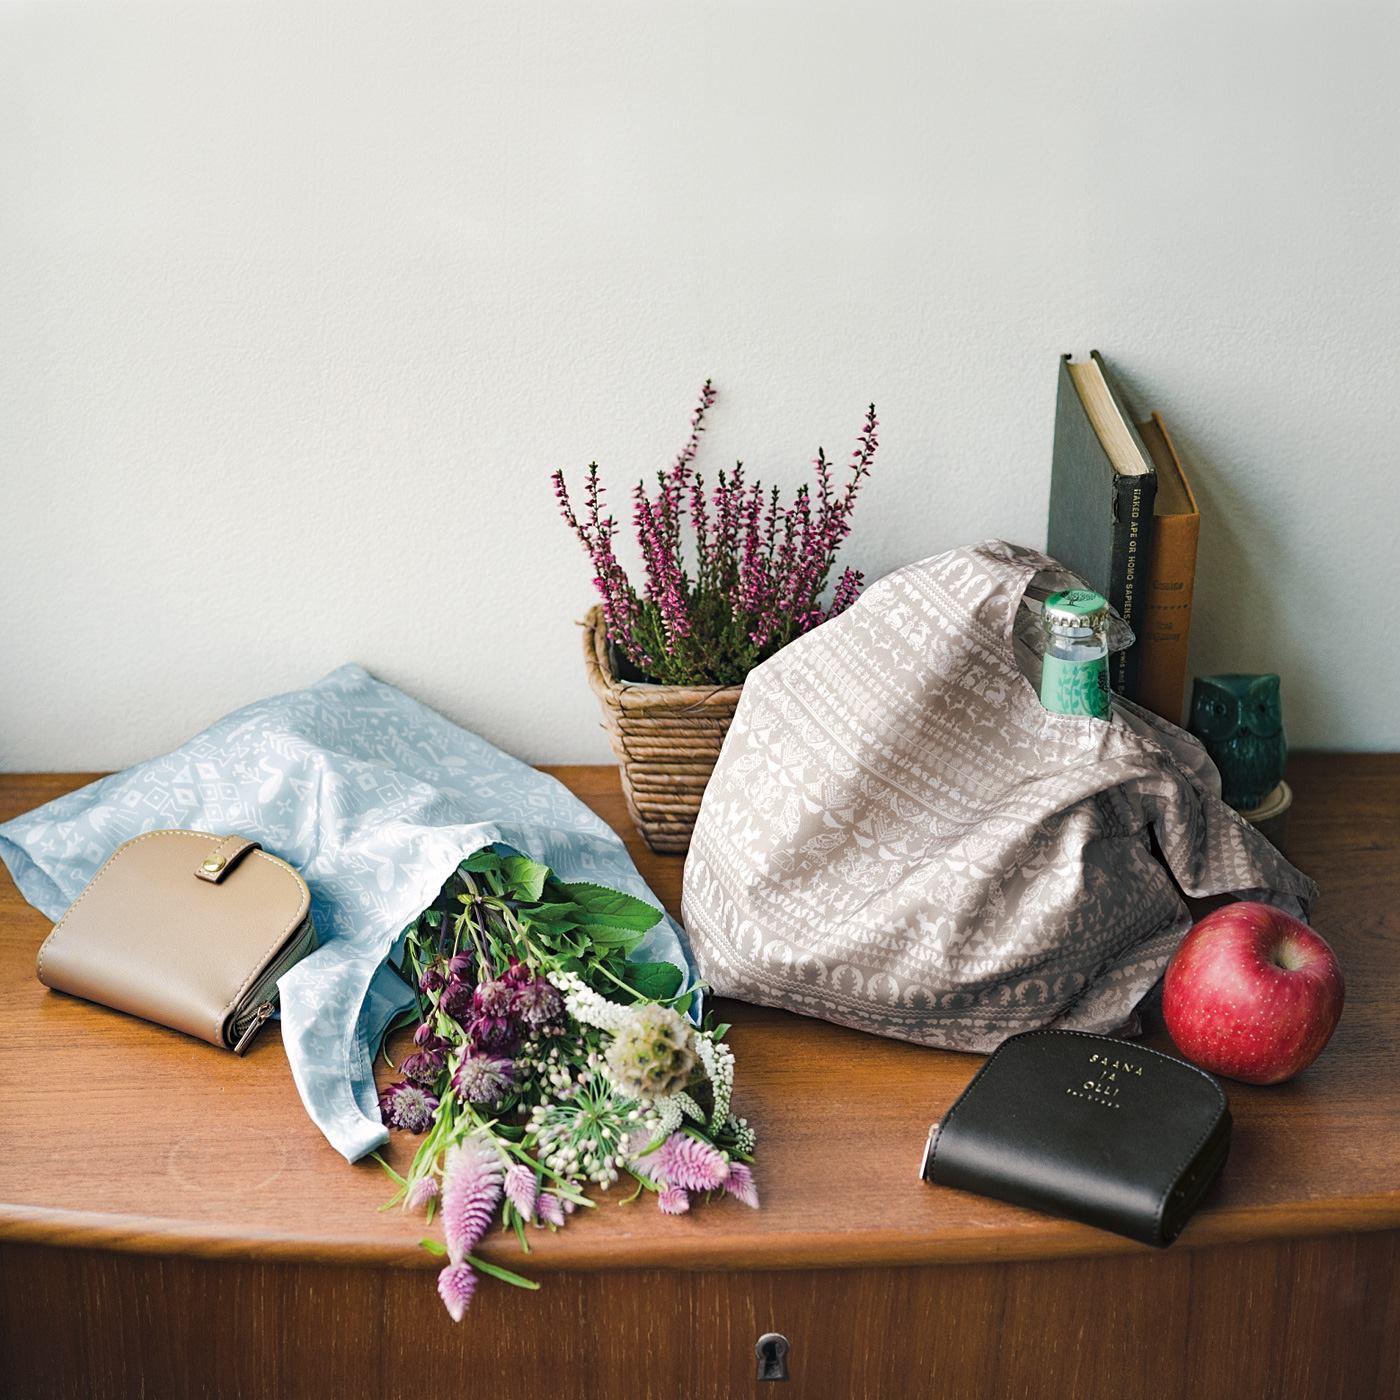 Kraso[クラソ] SAANA JA OLLI サーナ ヤ オッリ ミニエコバッグと収納ポケット付きの二つ折り財布の会